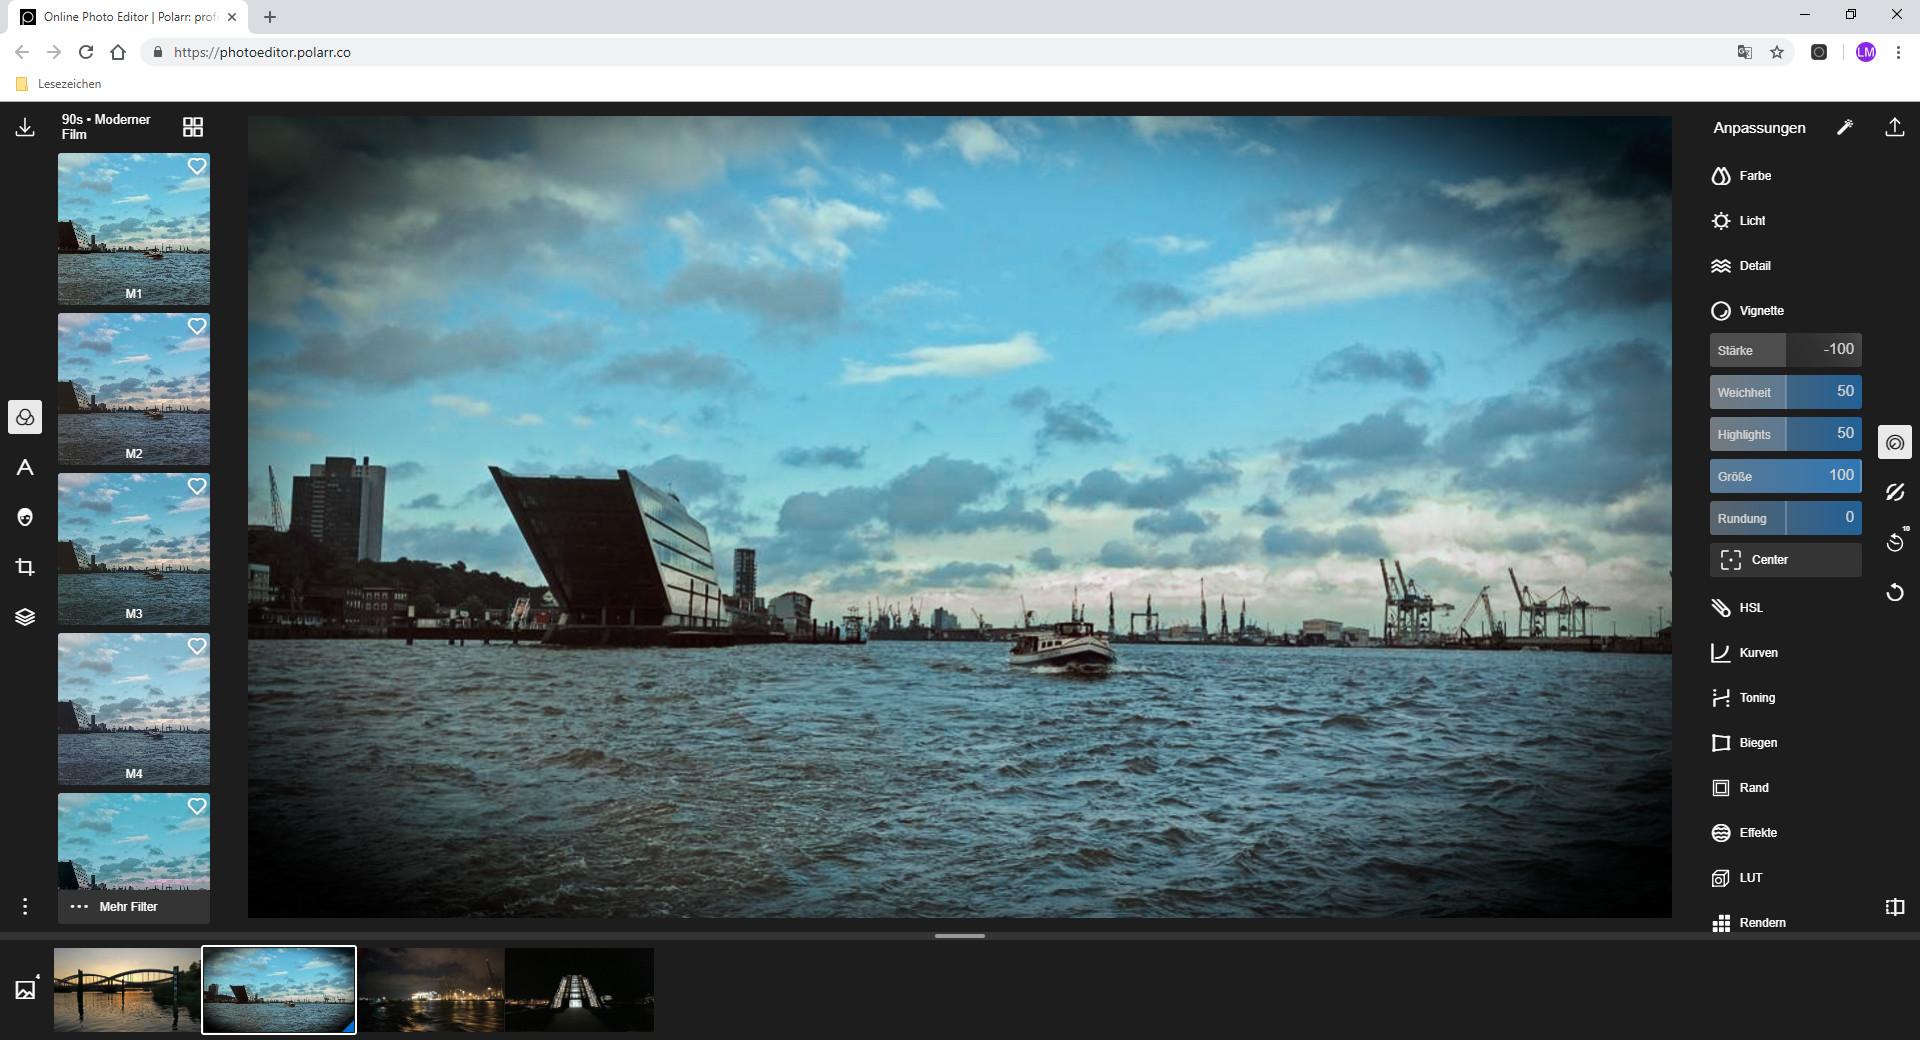 Screenshot 1 - Polarr Photo Editor für Chrome